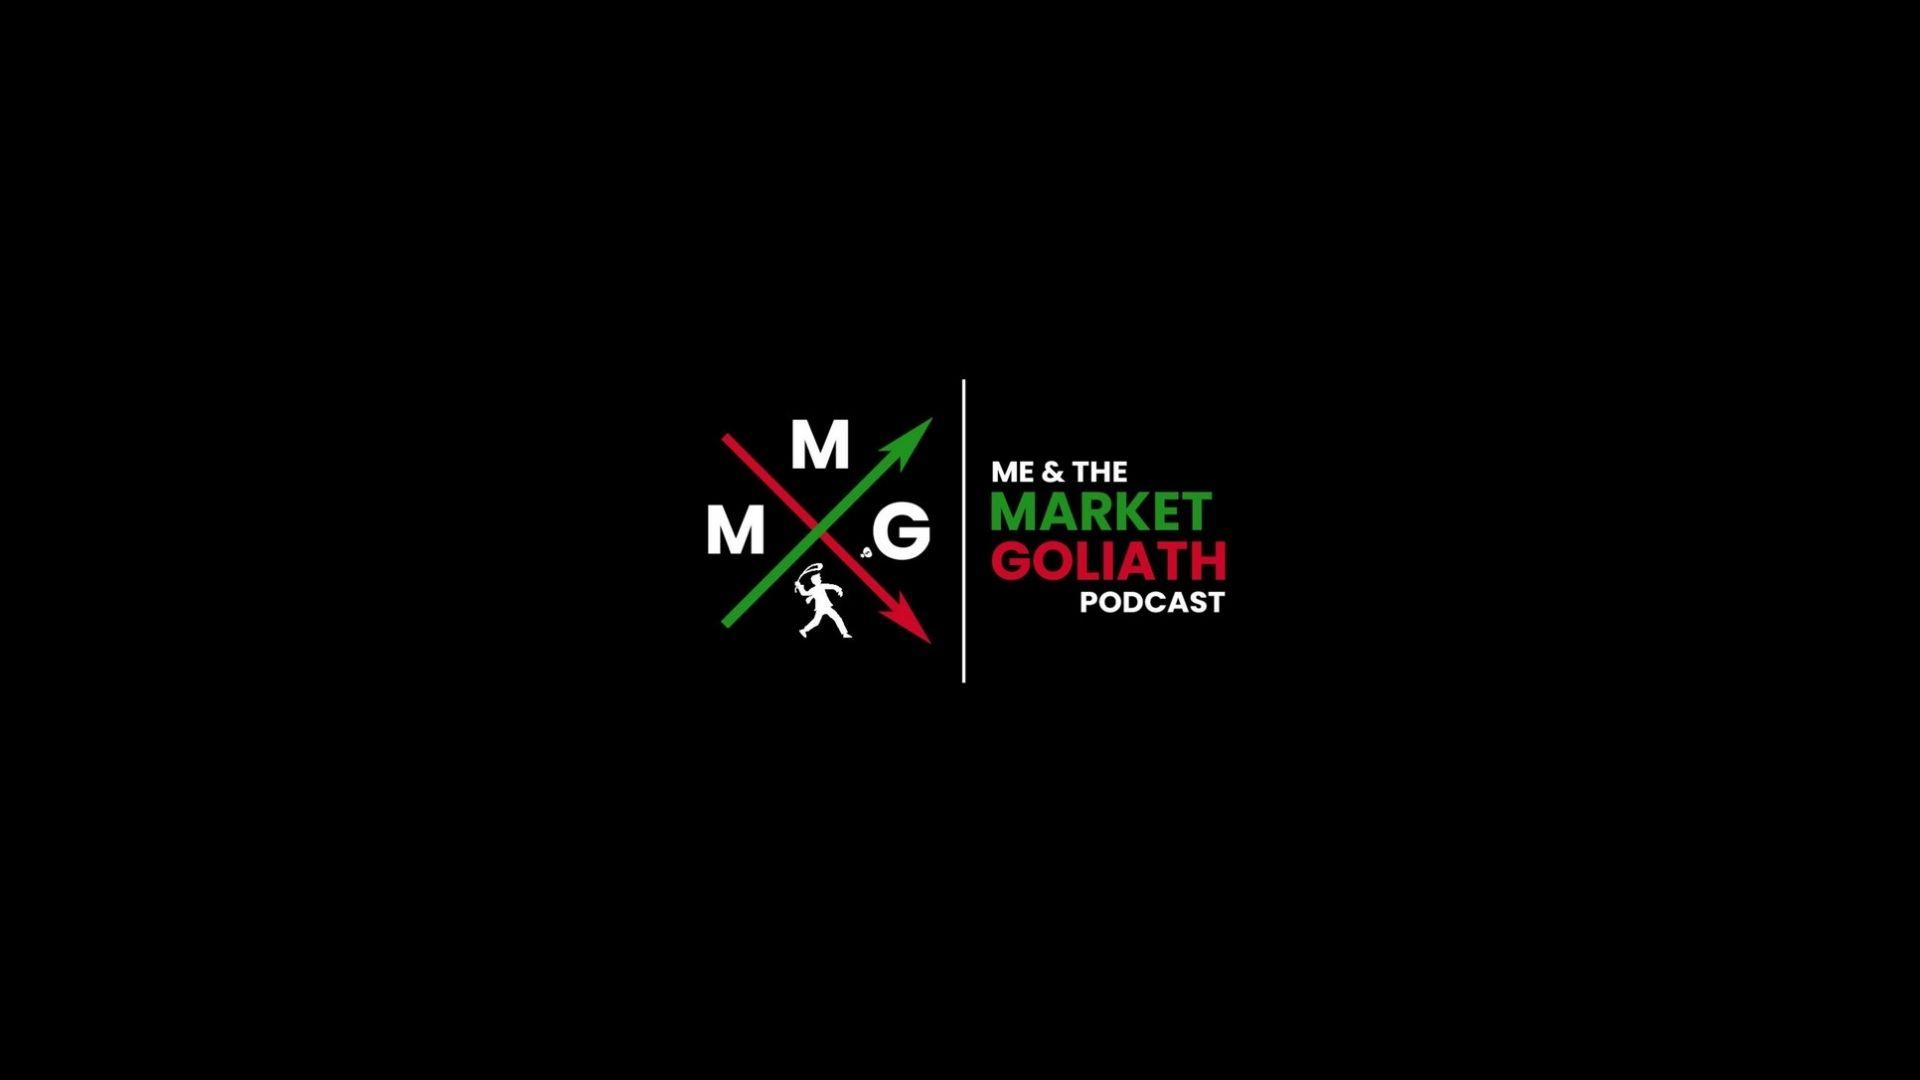 Me & The Market Goliath: Special Purpose Acquisition Companies (SPACs) w. Julian Klymochko (CFA)